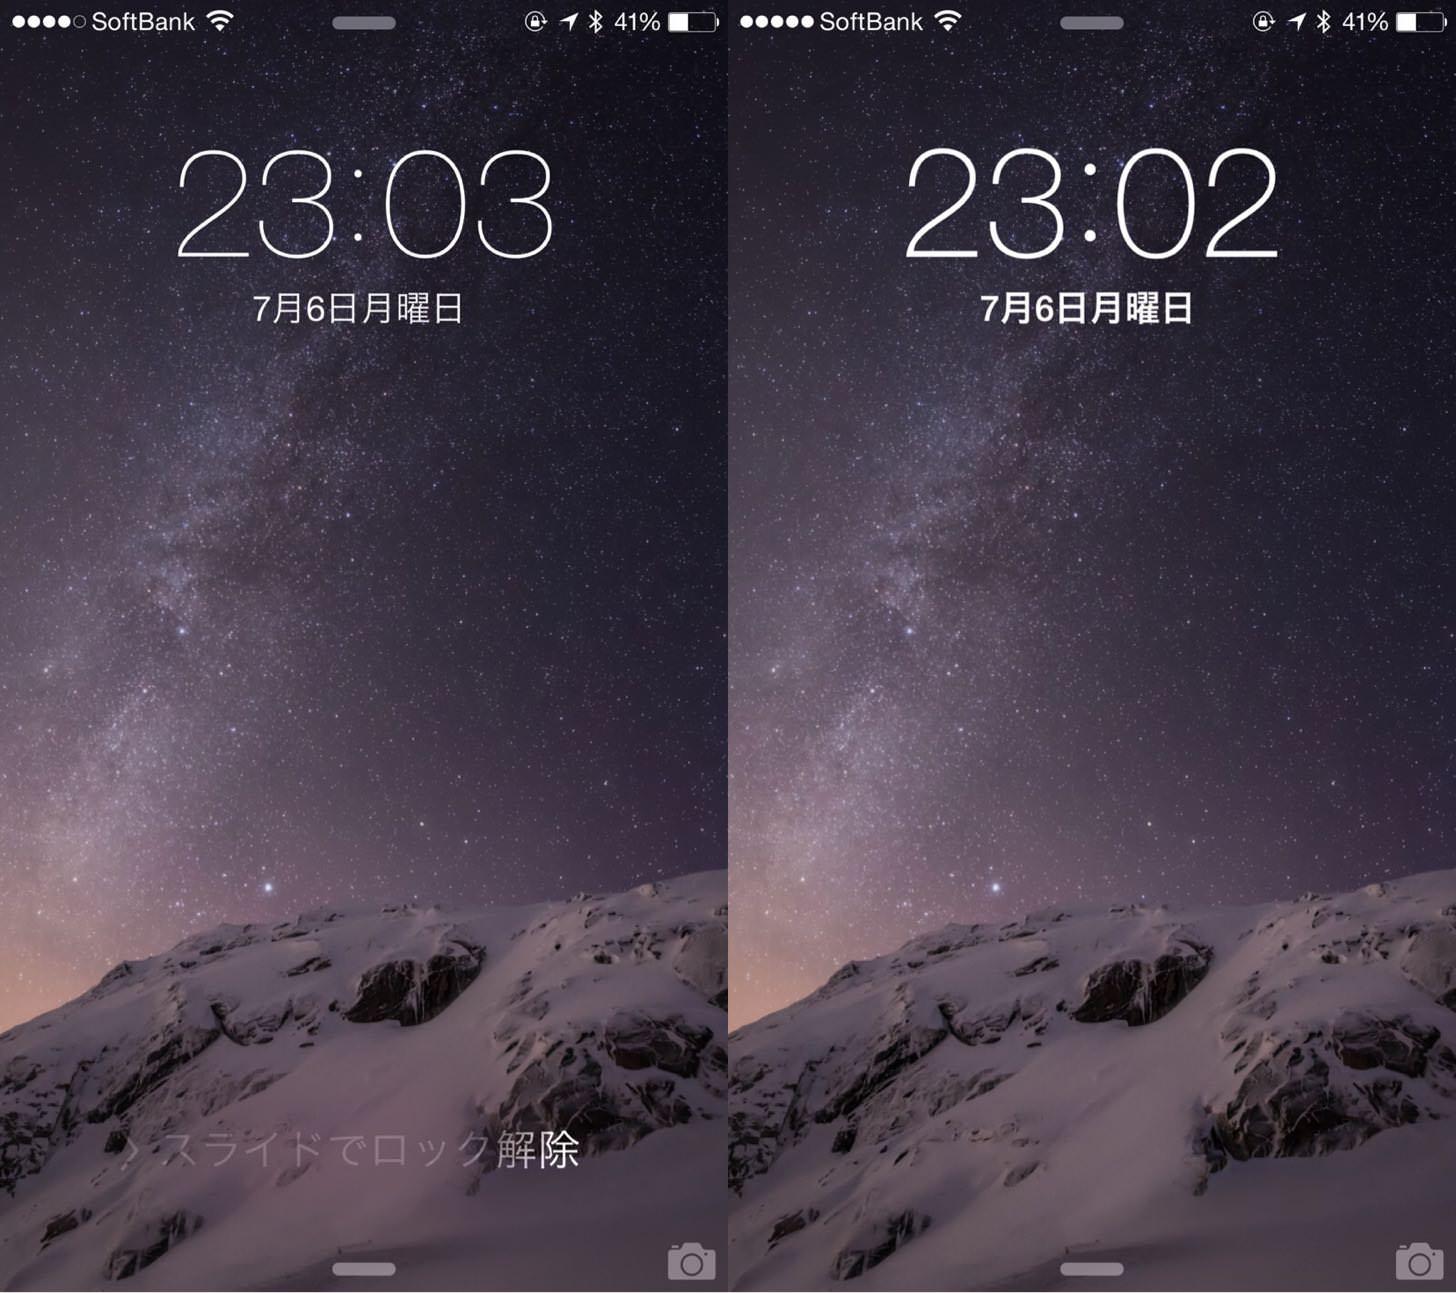 iPhoneのシステムフォント(文字)を太くする設定方法。